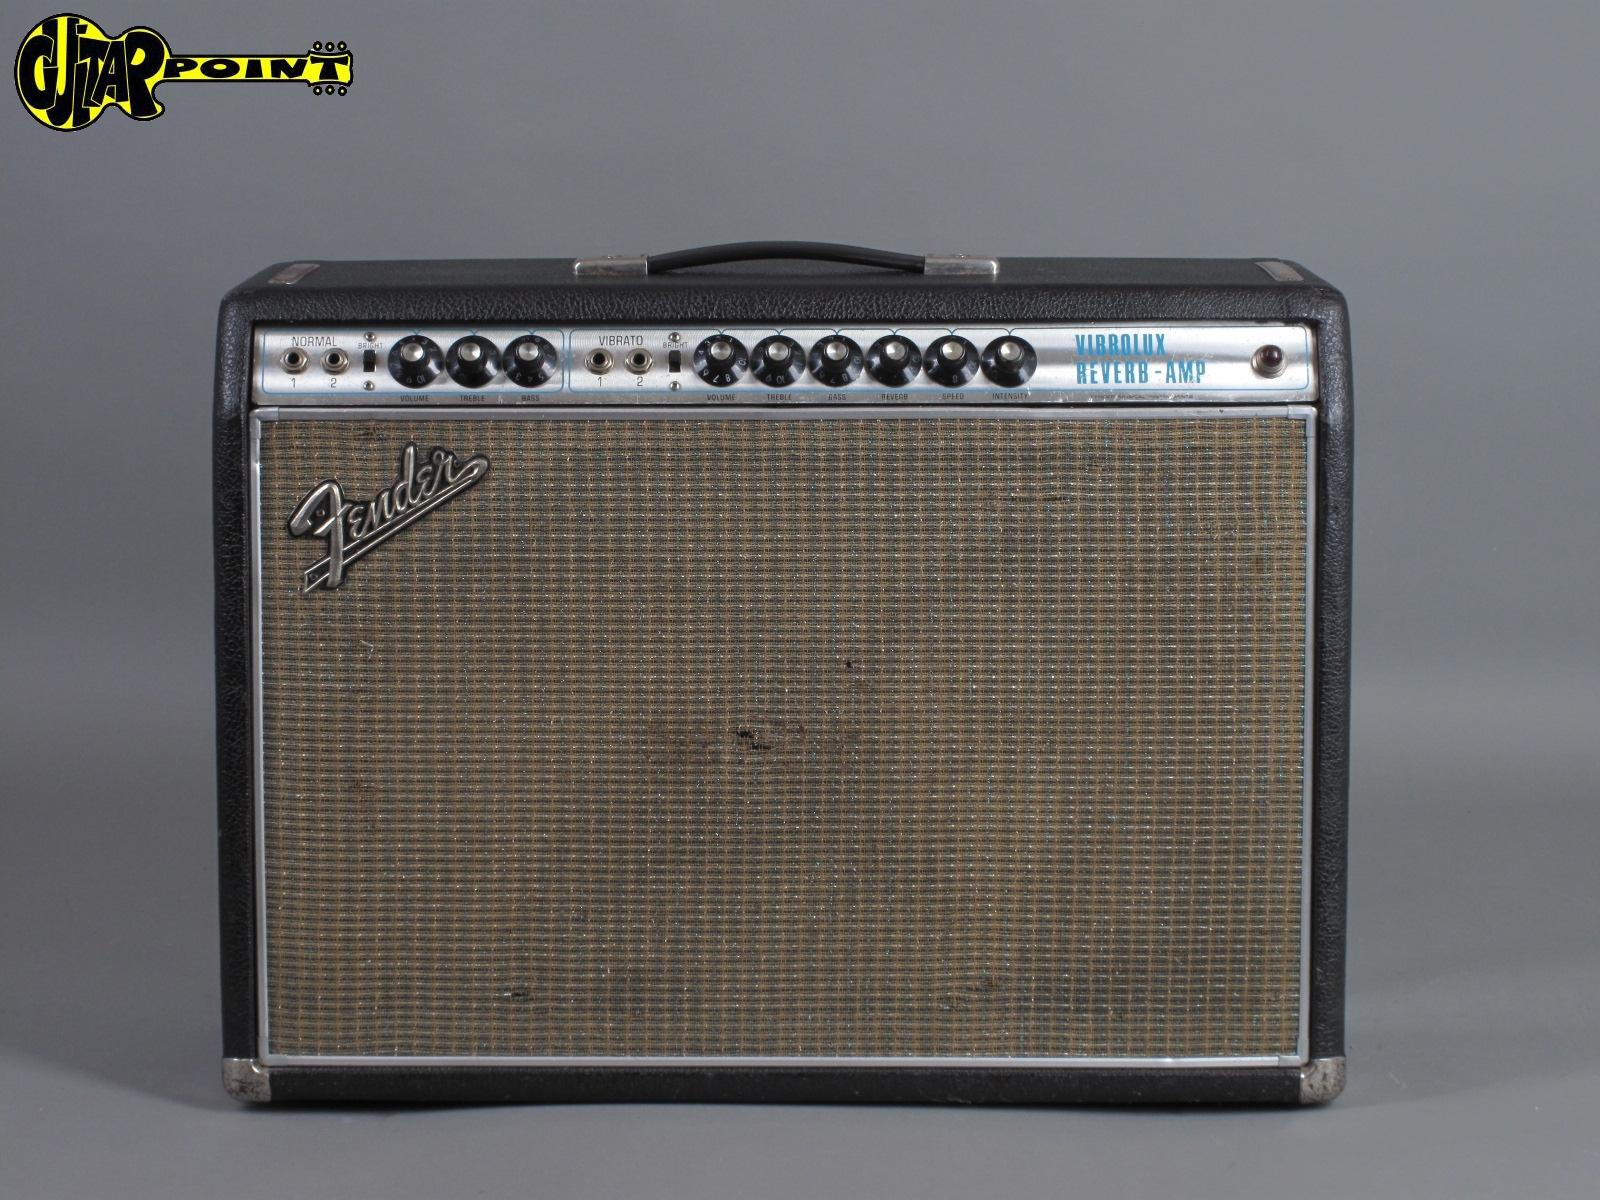 1969 Fender Vibrolux  Reverb Amp  ...Export - Version !